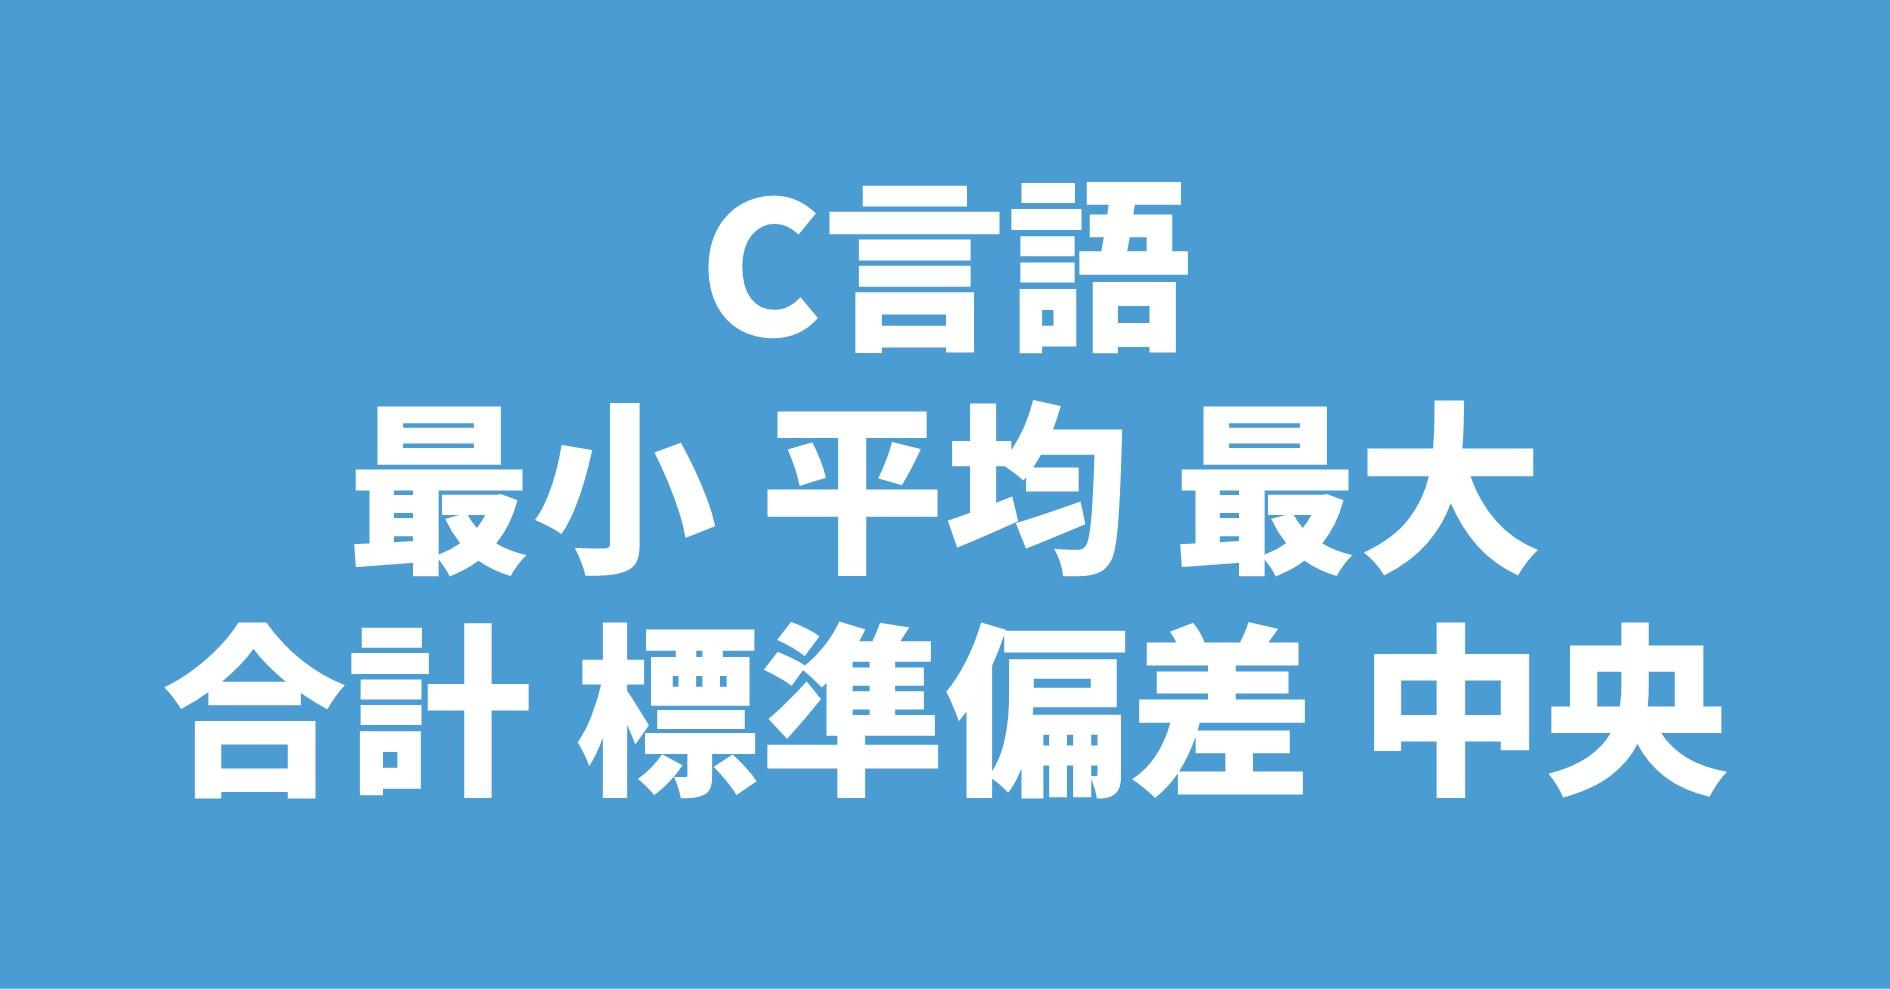 C言語 最小 平均 最大 合計 標準偏差 中央